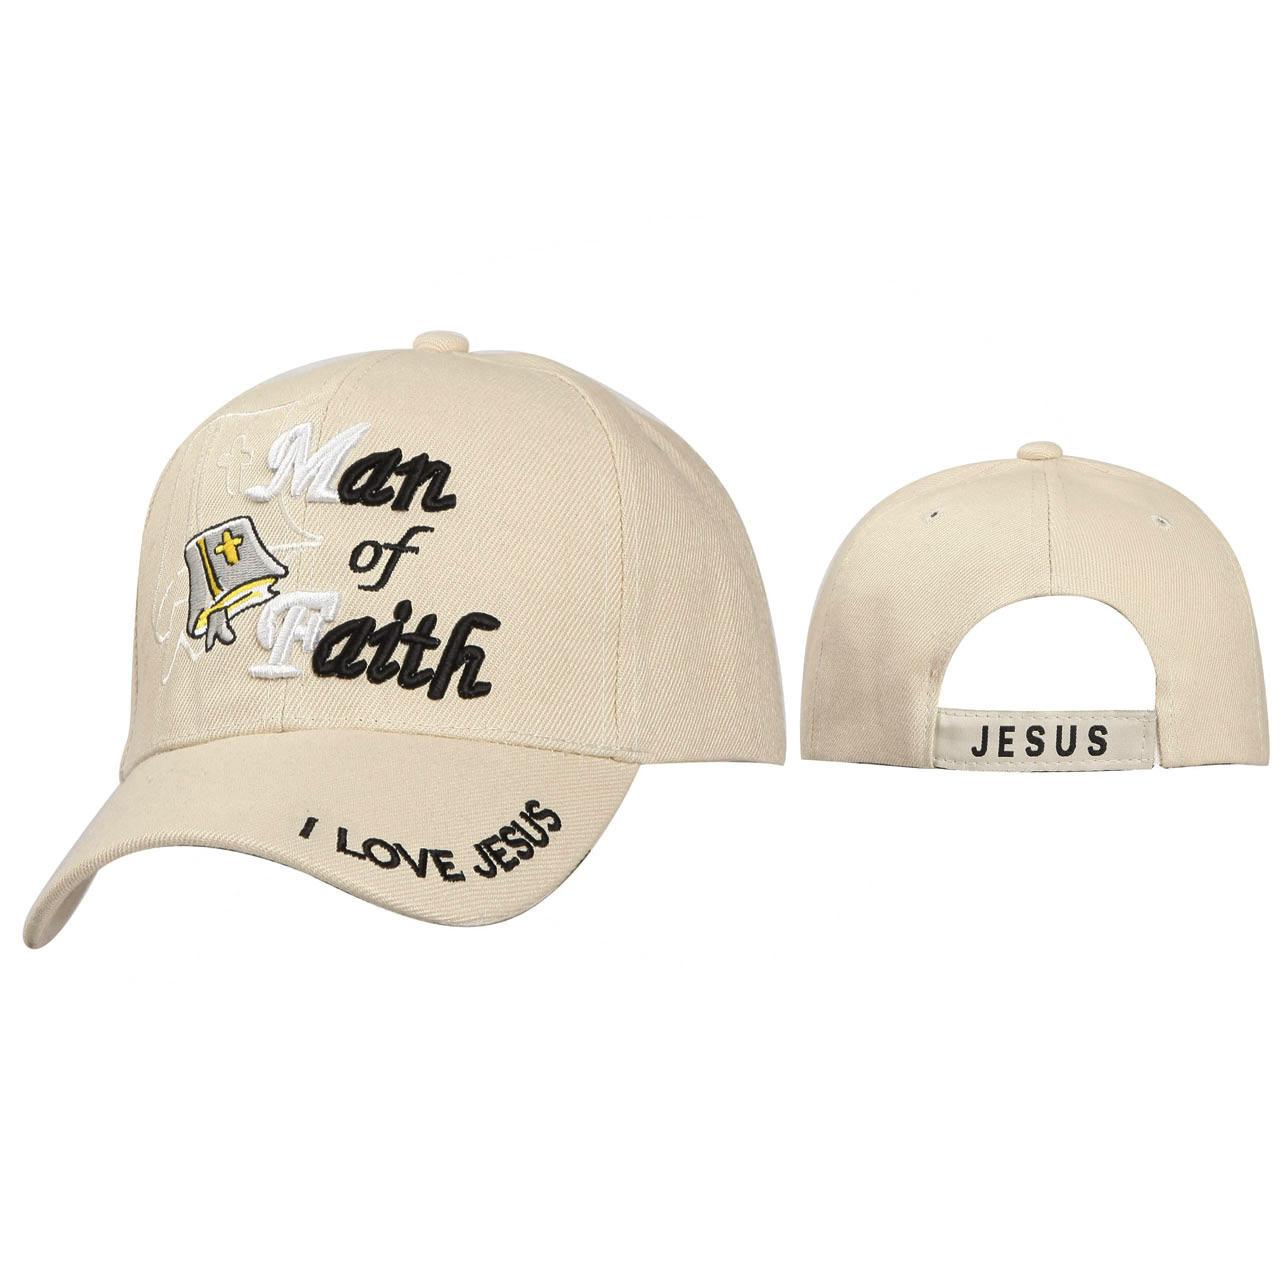 Wholesale Christian Hats ~ Man of Faith ~ Beige